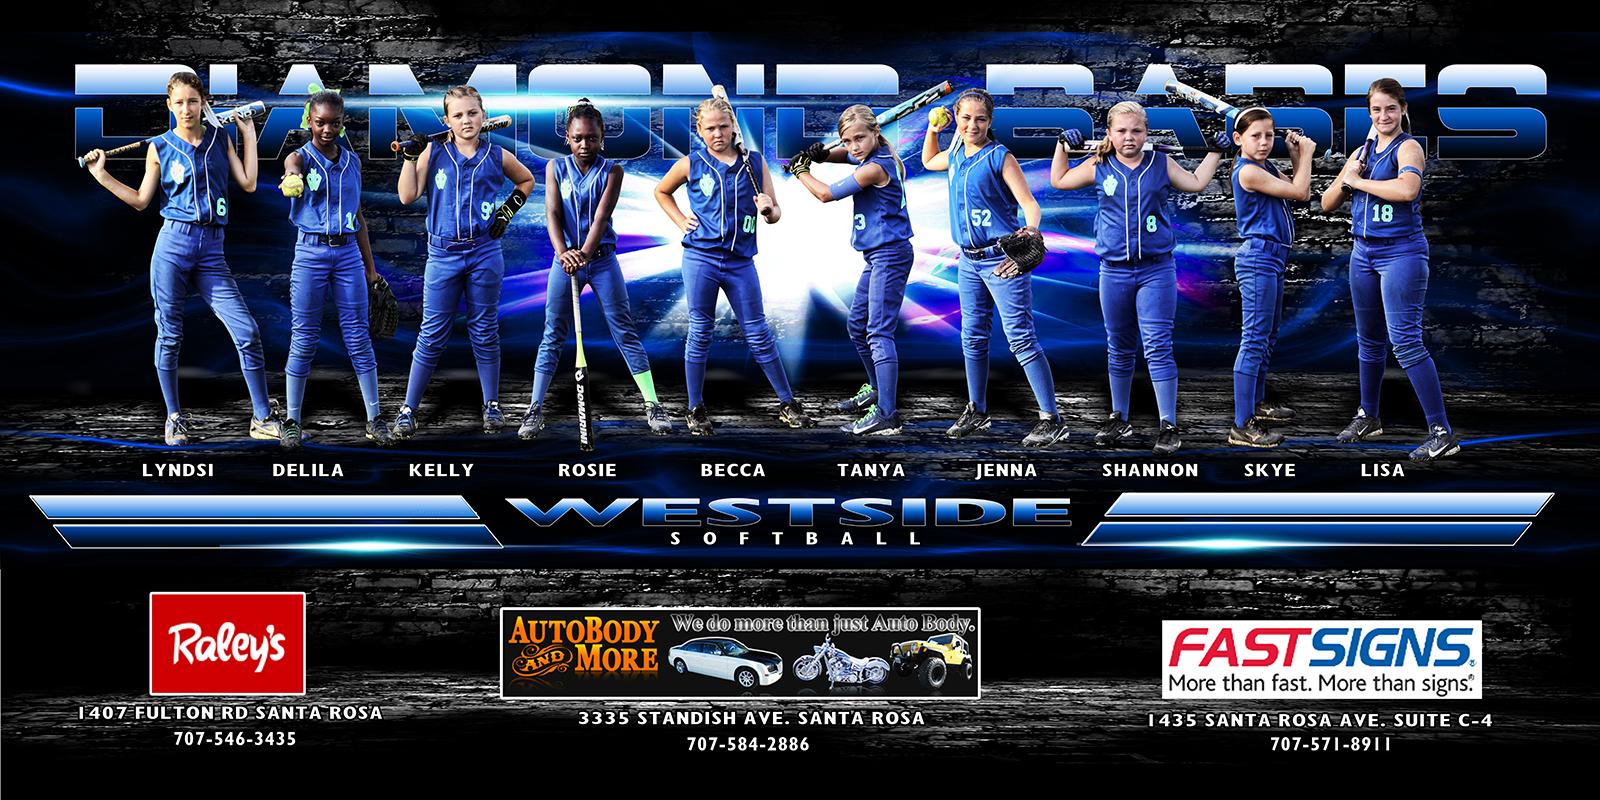 Mvp Sports Pix Game Day Sponsor Banners